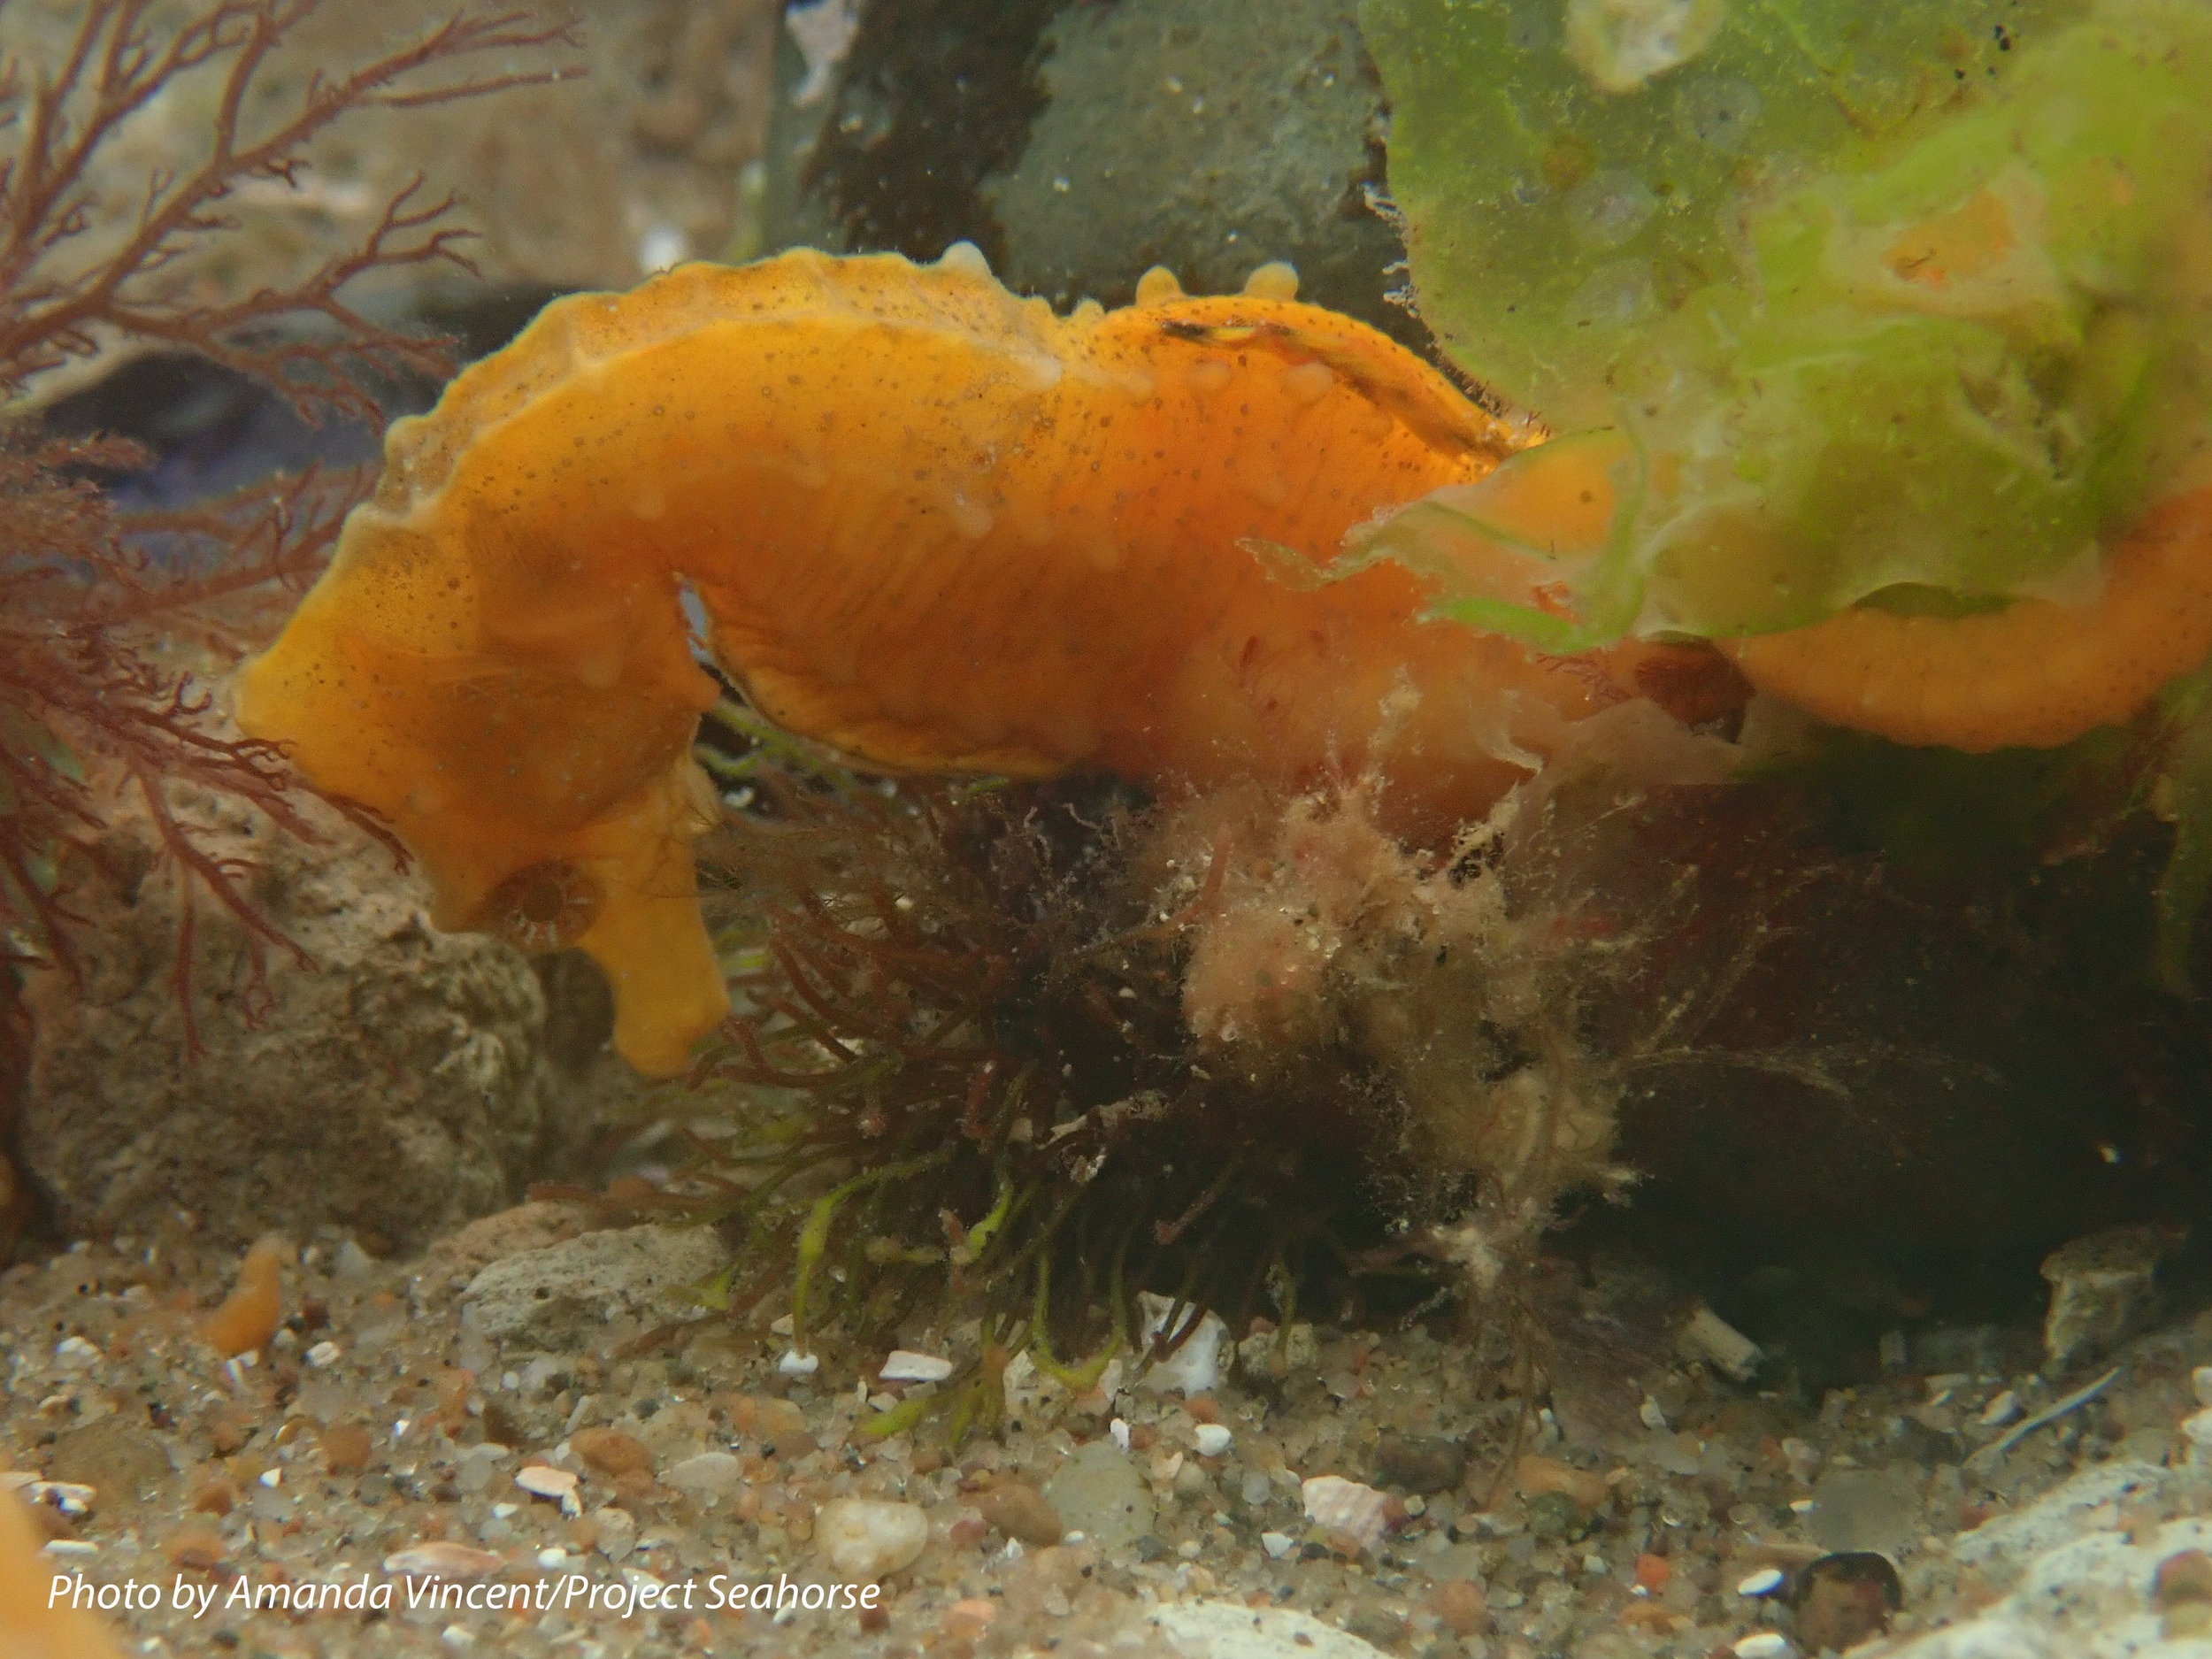 patagonicus-male-2-2017_AV.jpg